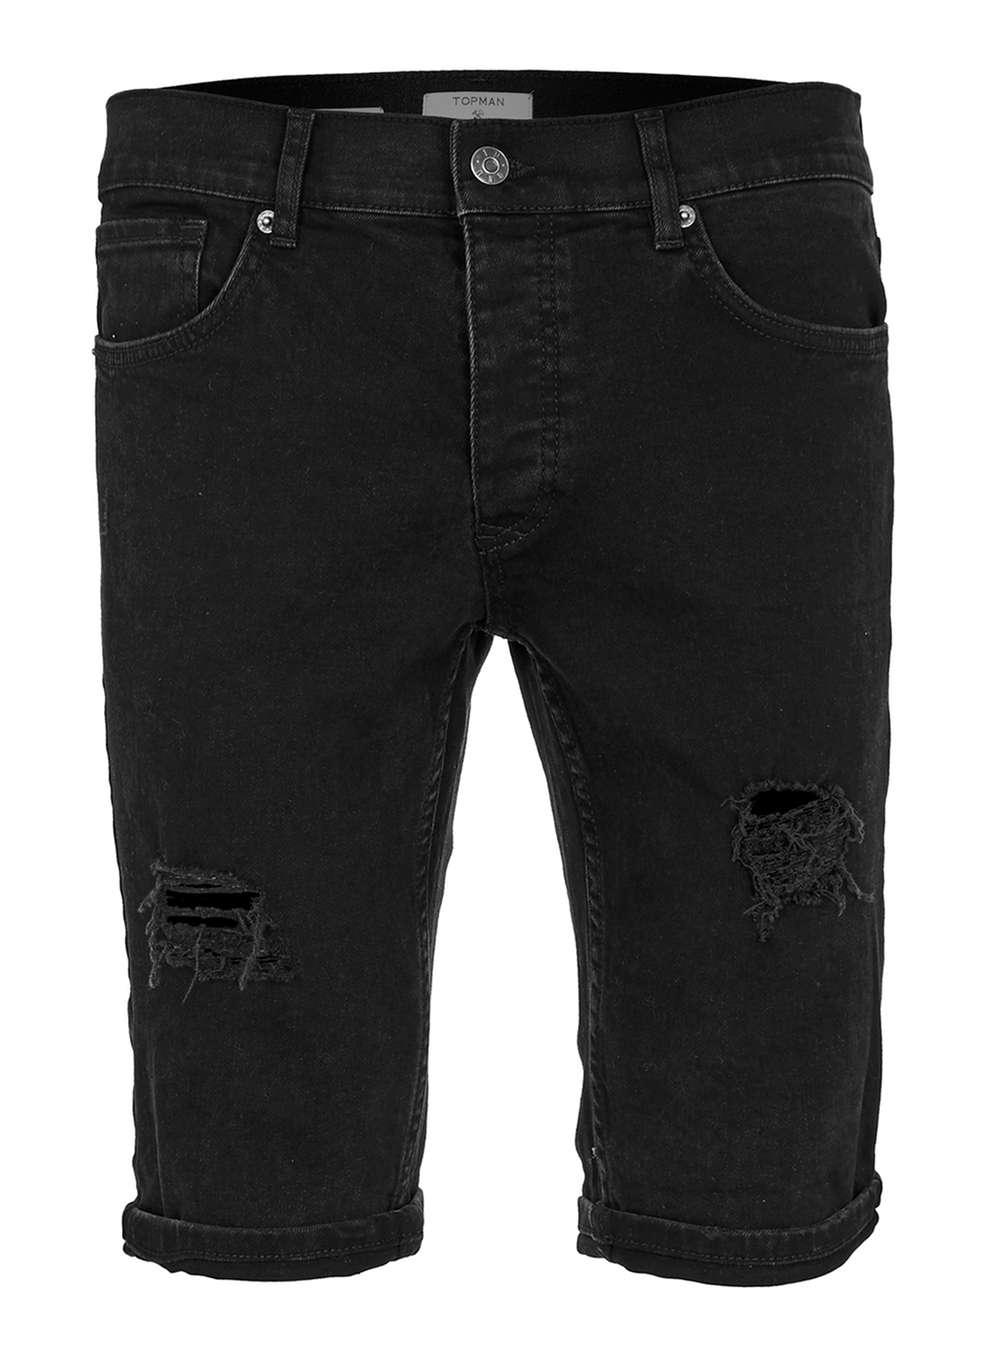 Topman Black Denim Shorts